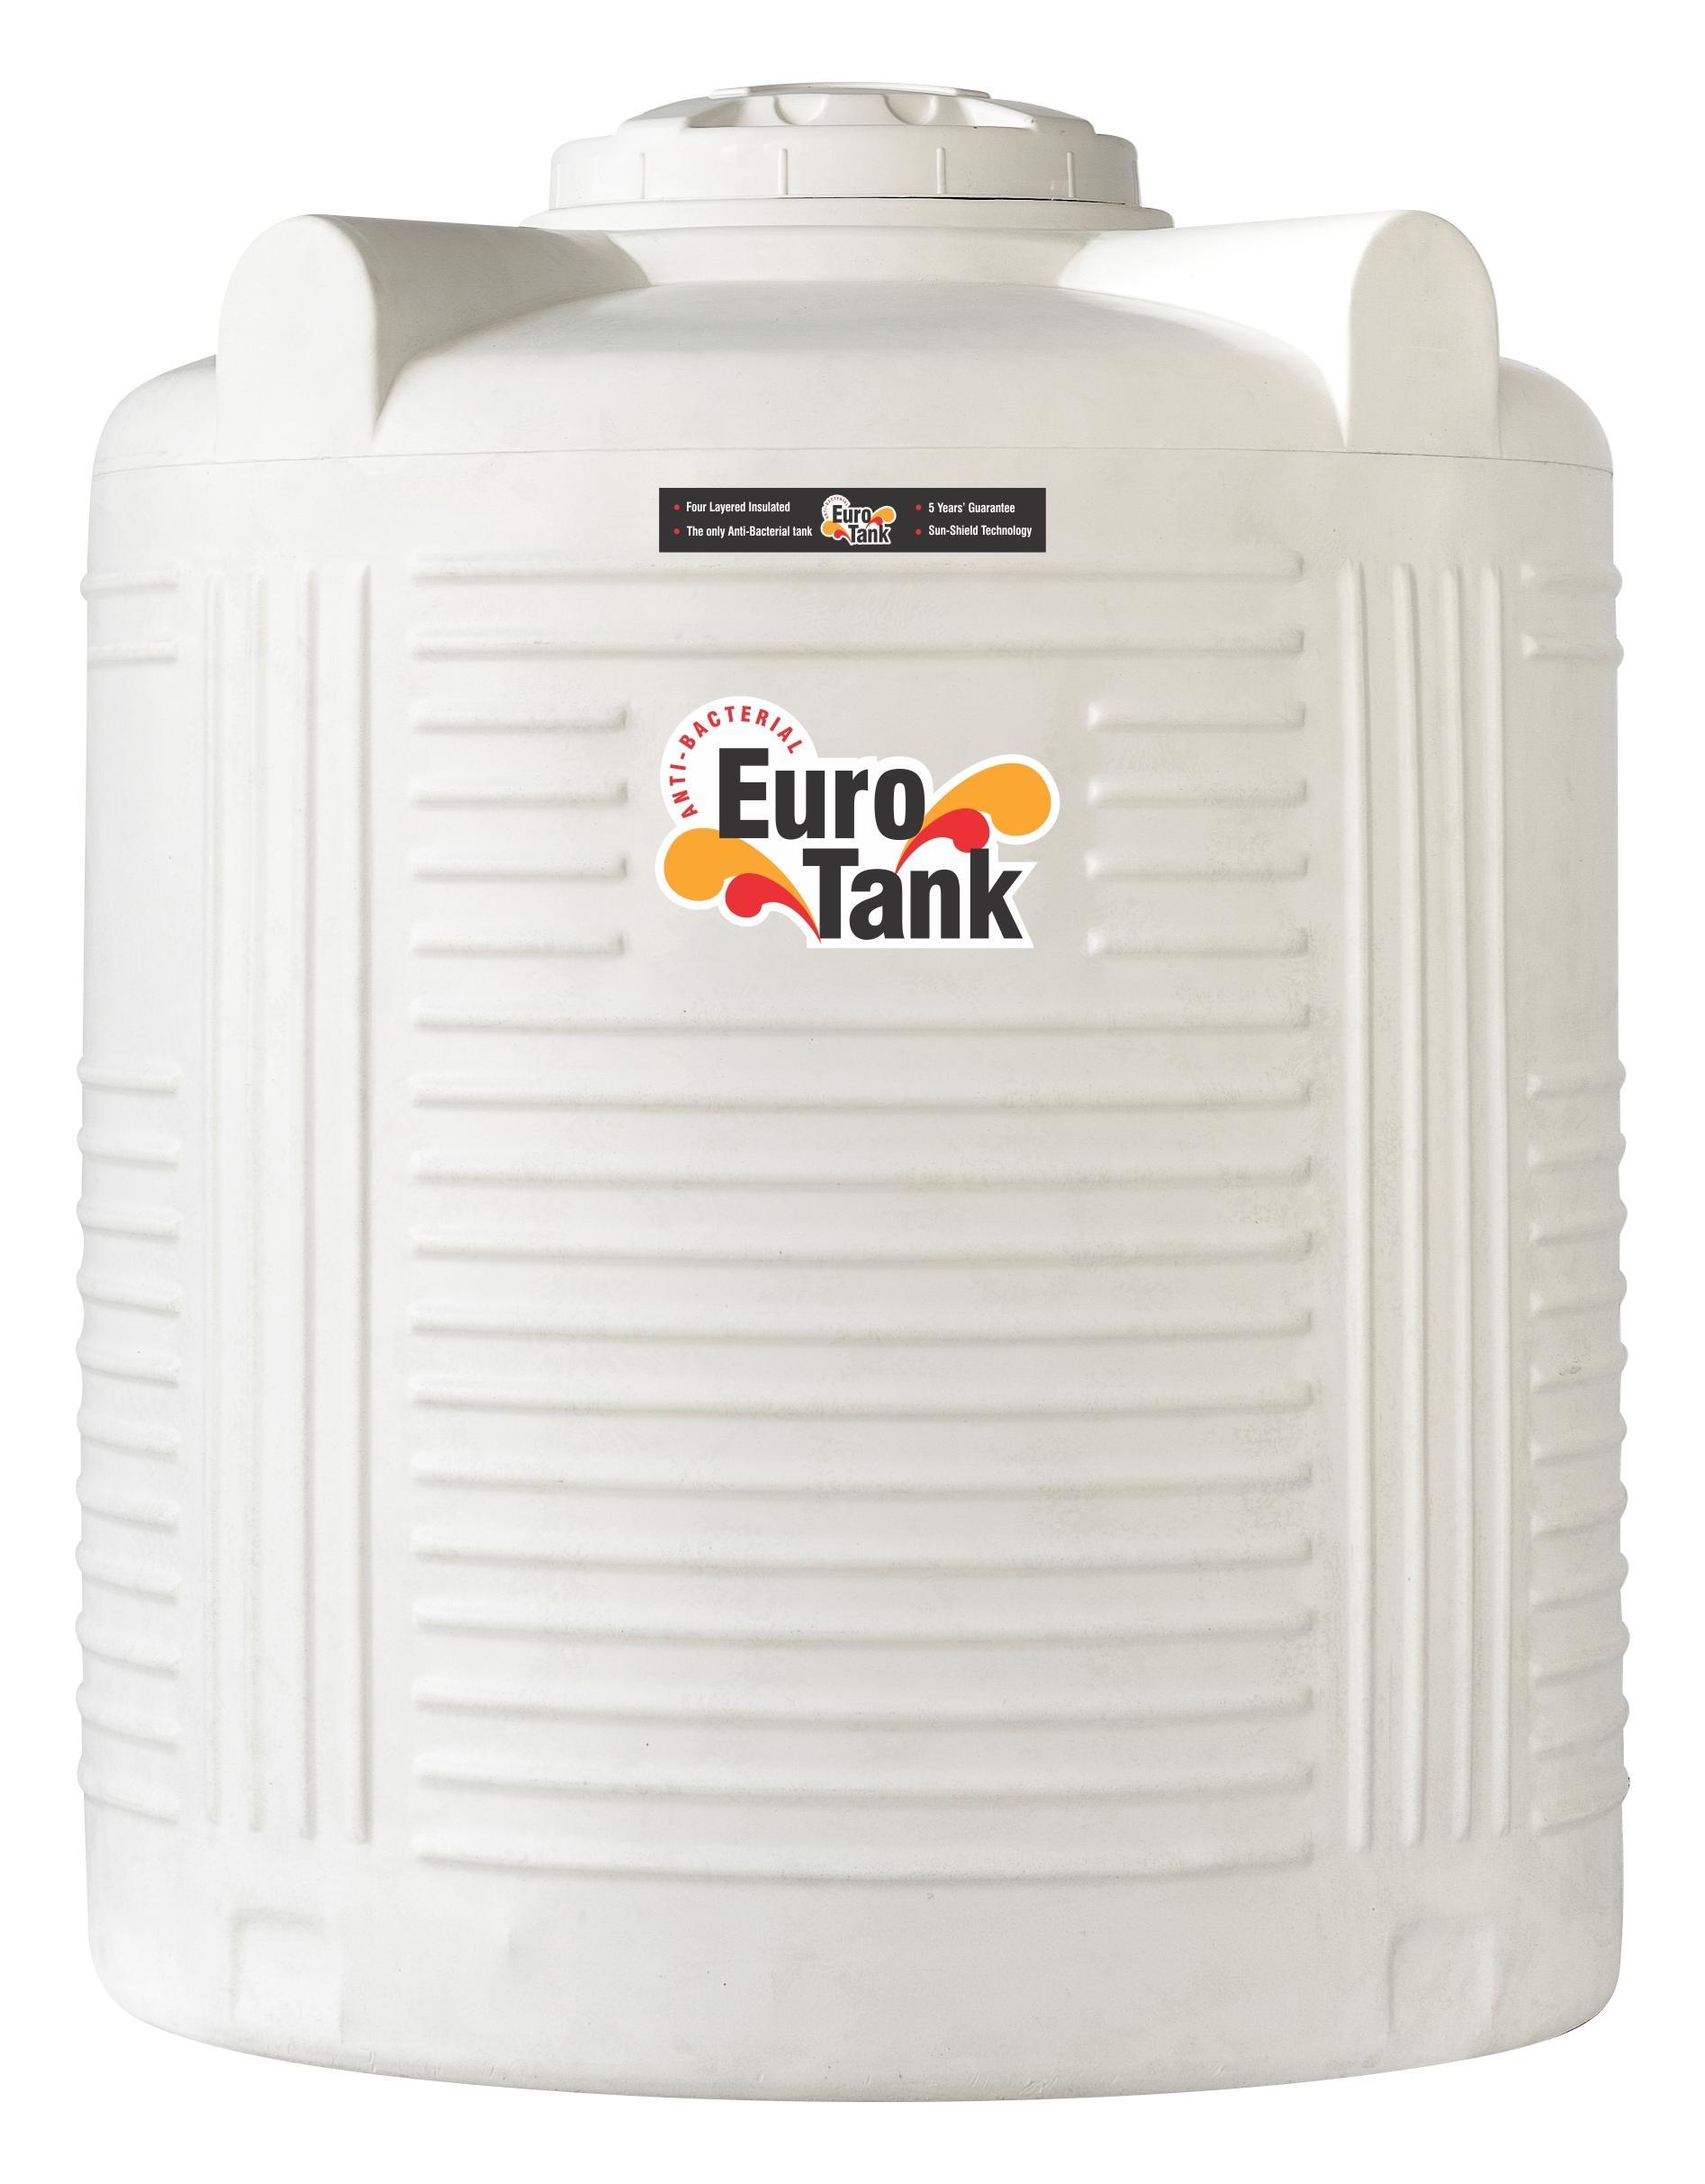 Euro Water Storage Tank Euro Water Storage Tank Manufacturer Amp Supplier Noida India